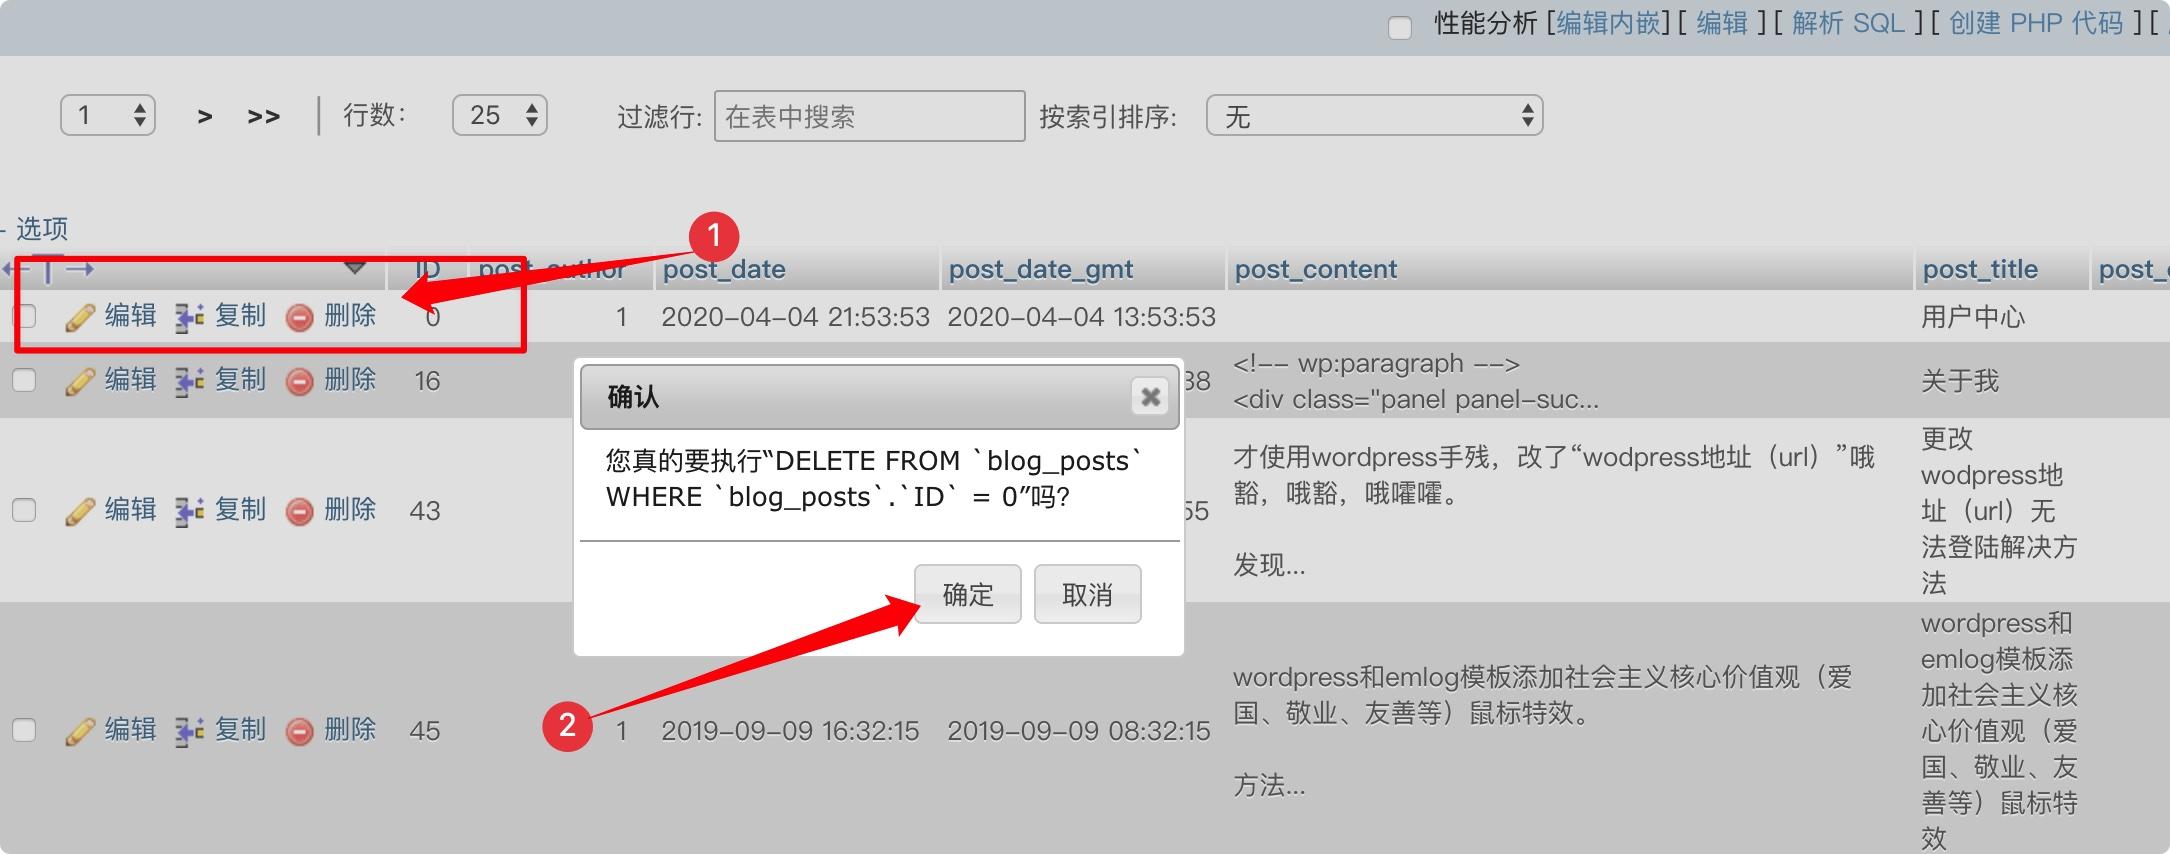 5e88954060345 - #1062 - Duplicate entry '0' for key 'PRIMARY'—— mysql主键设置问题